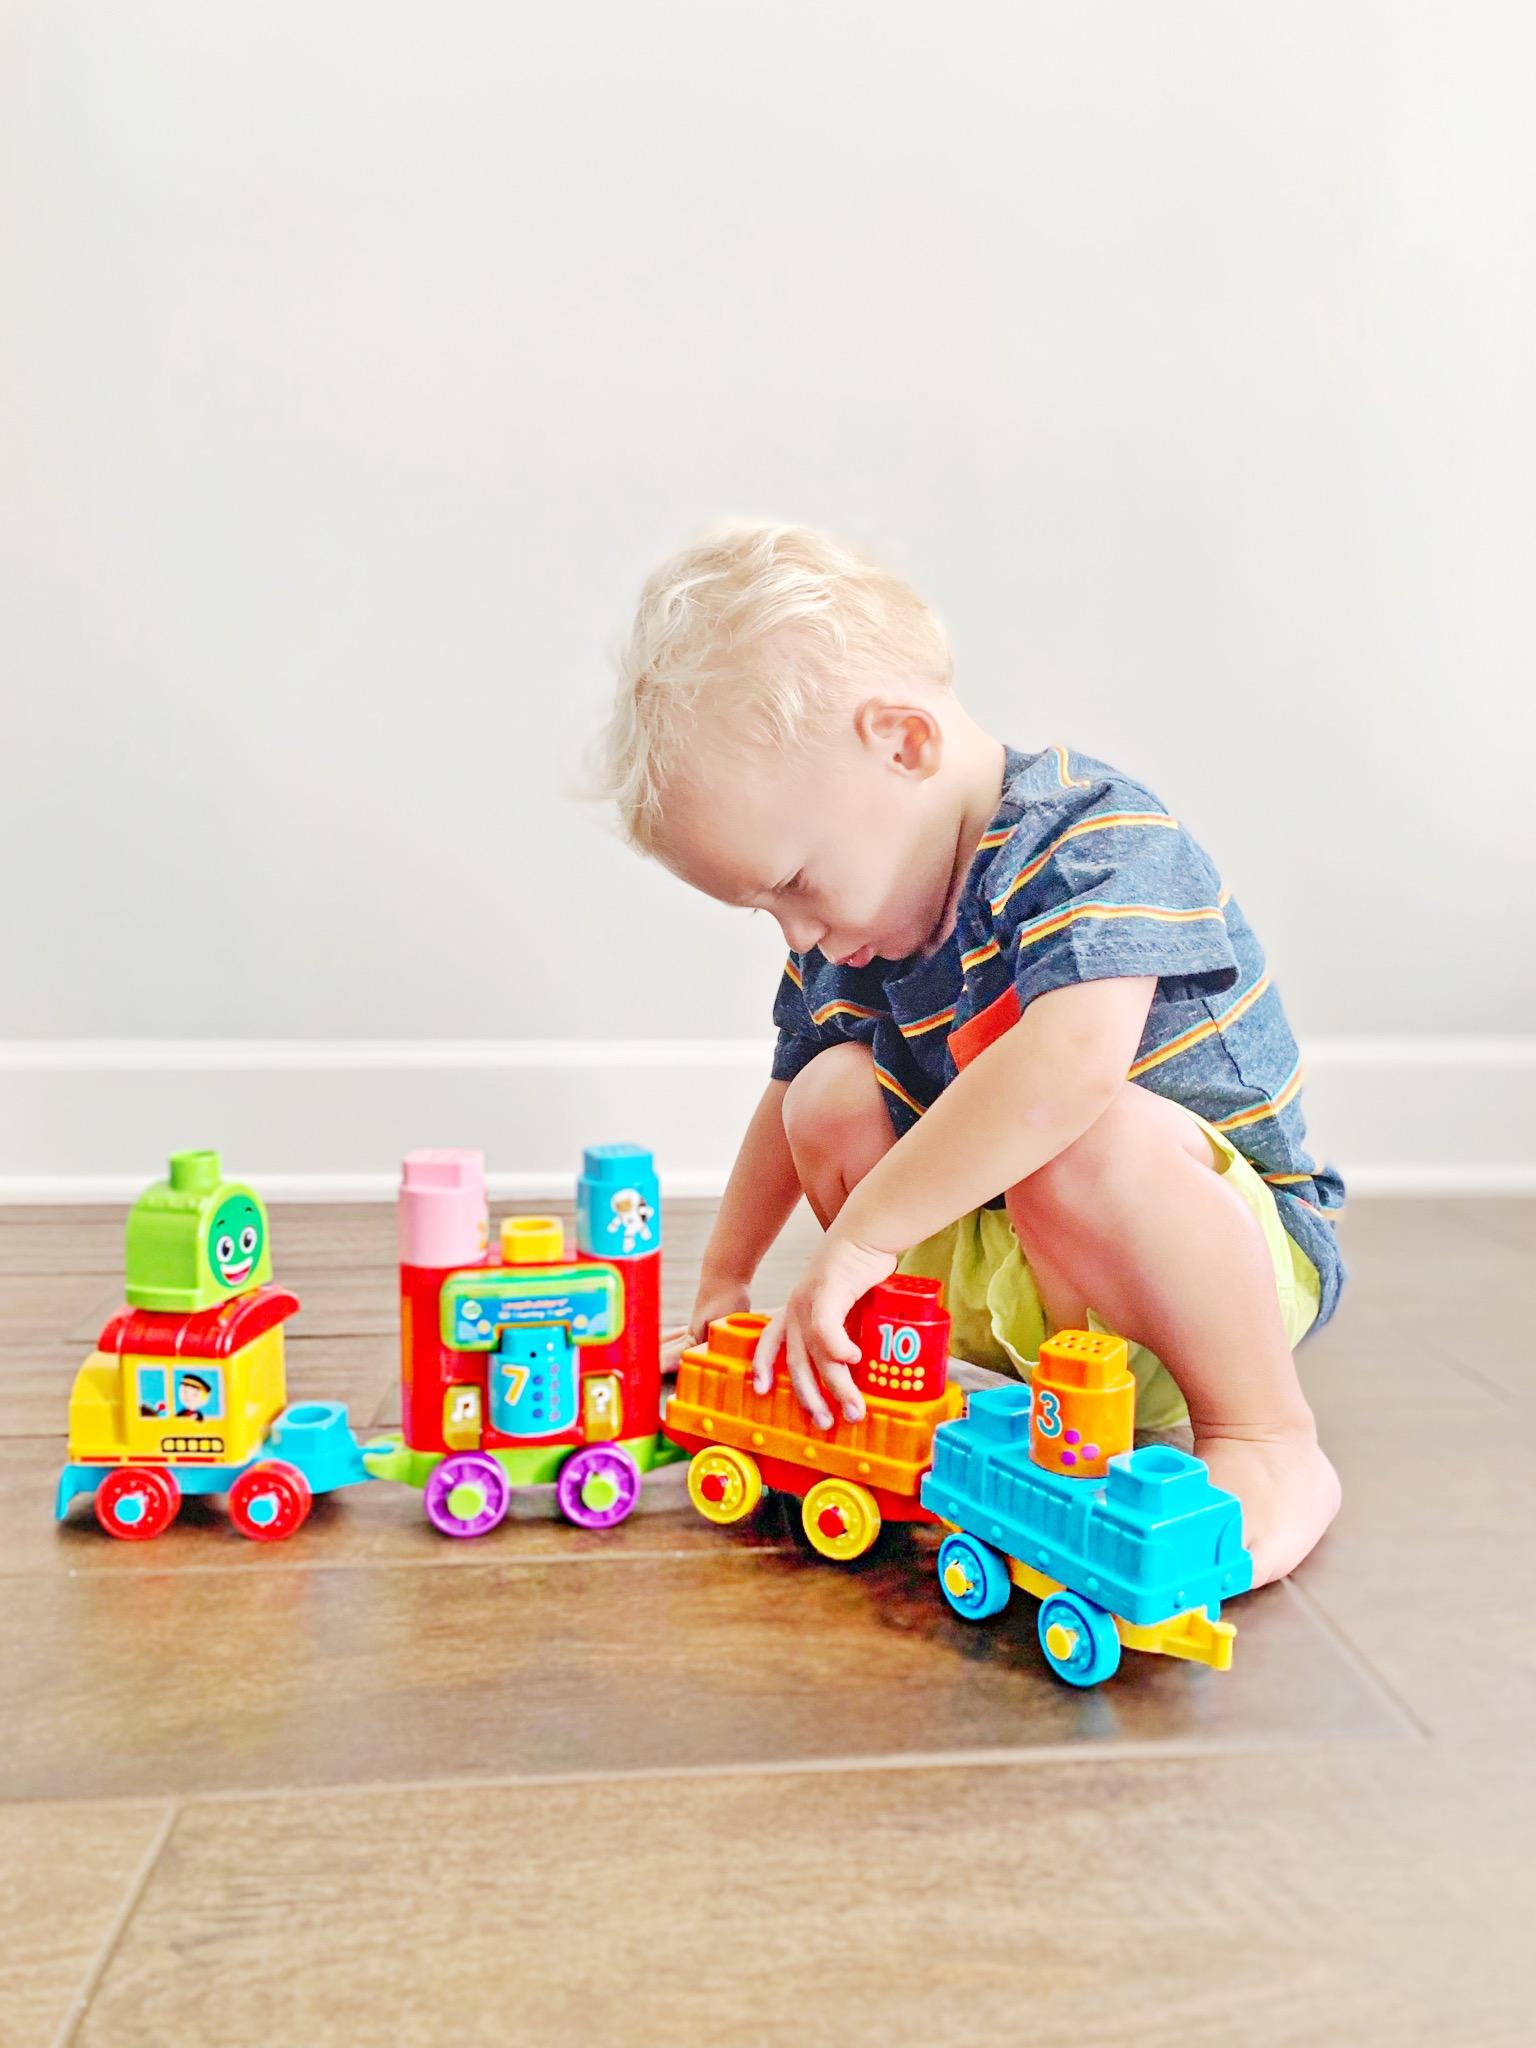 5 Educational Toddler Toys by LeapFrog